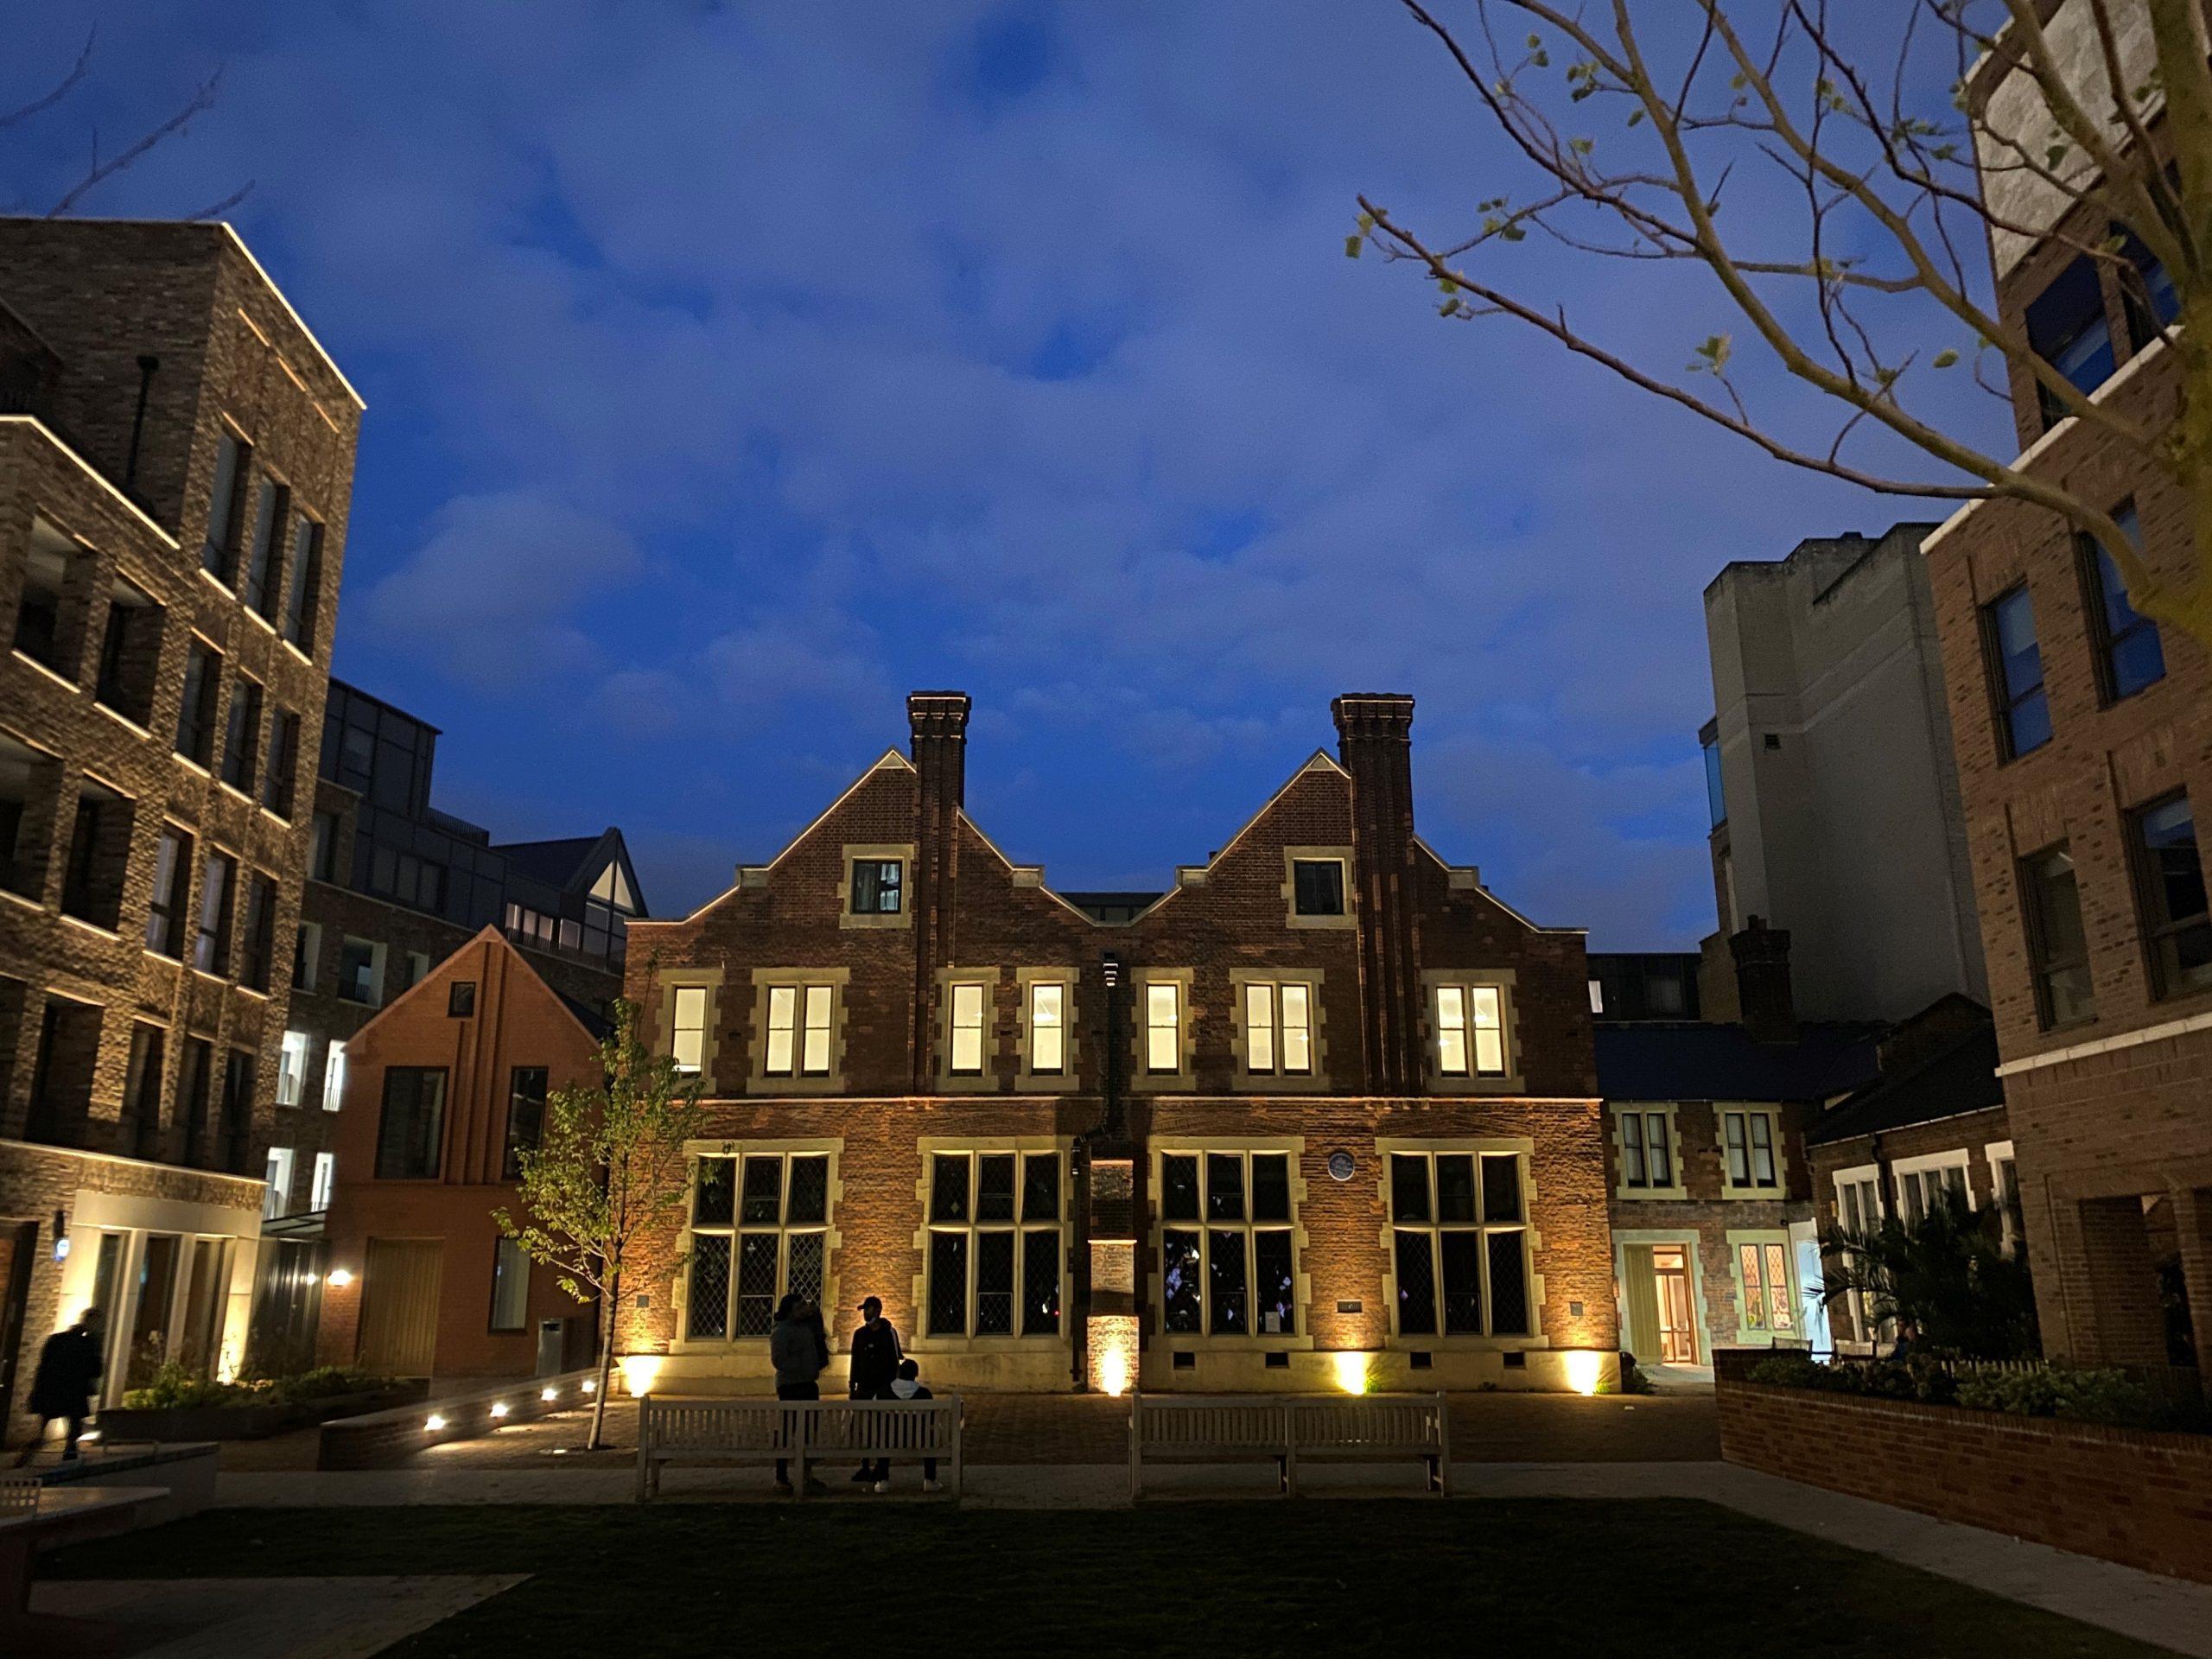 Toynbee Hall at night